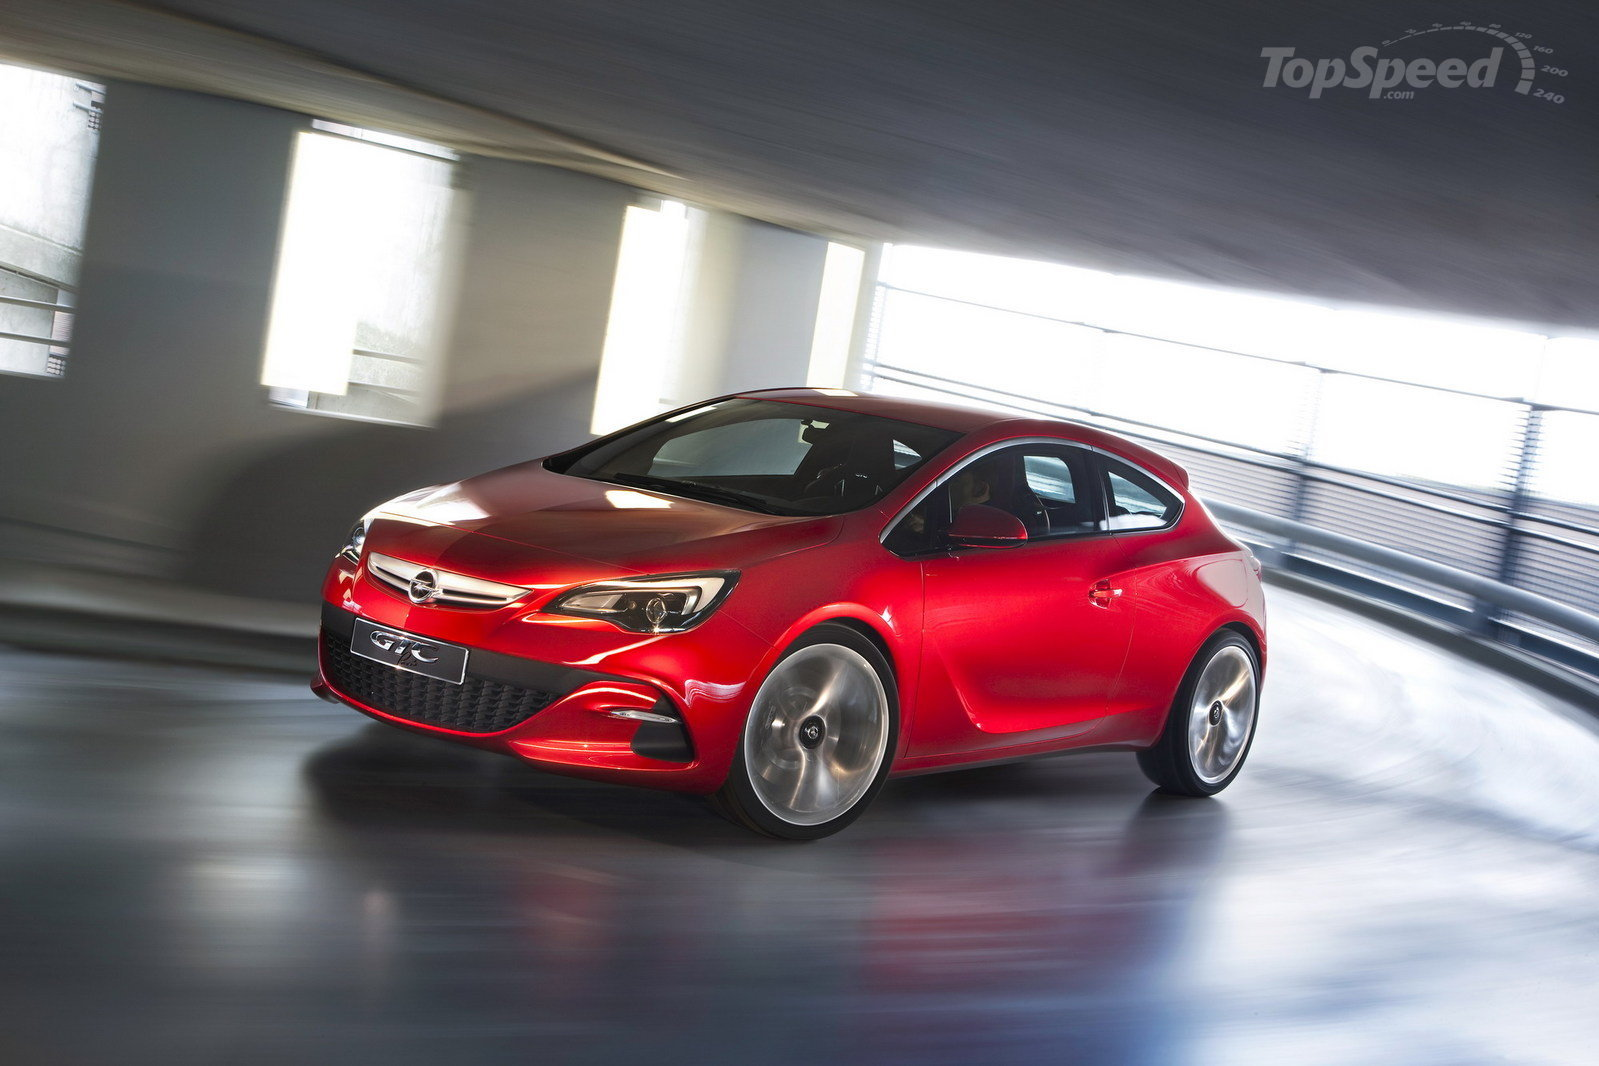 http://1.bp.blogspot.com/-mAR5kqD4a0w/TcLD5ToKRnI/AAAAAAAAAM4/OjE2TwsEHjo/s1600/Opel%20Astra%20GTC.jpg